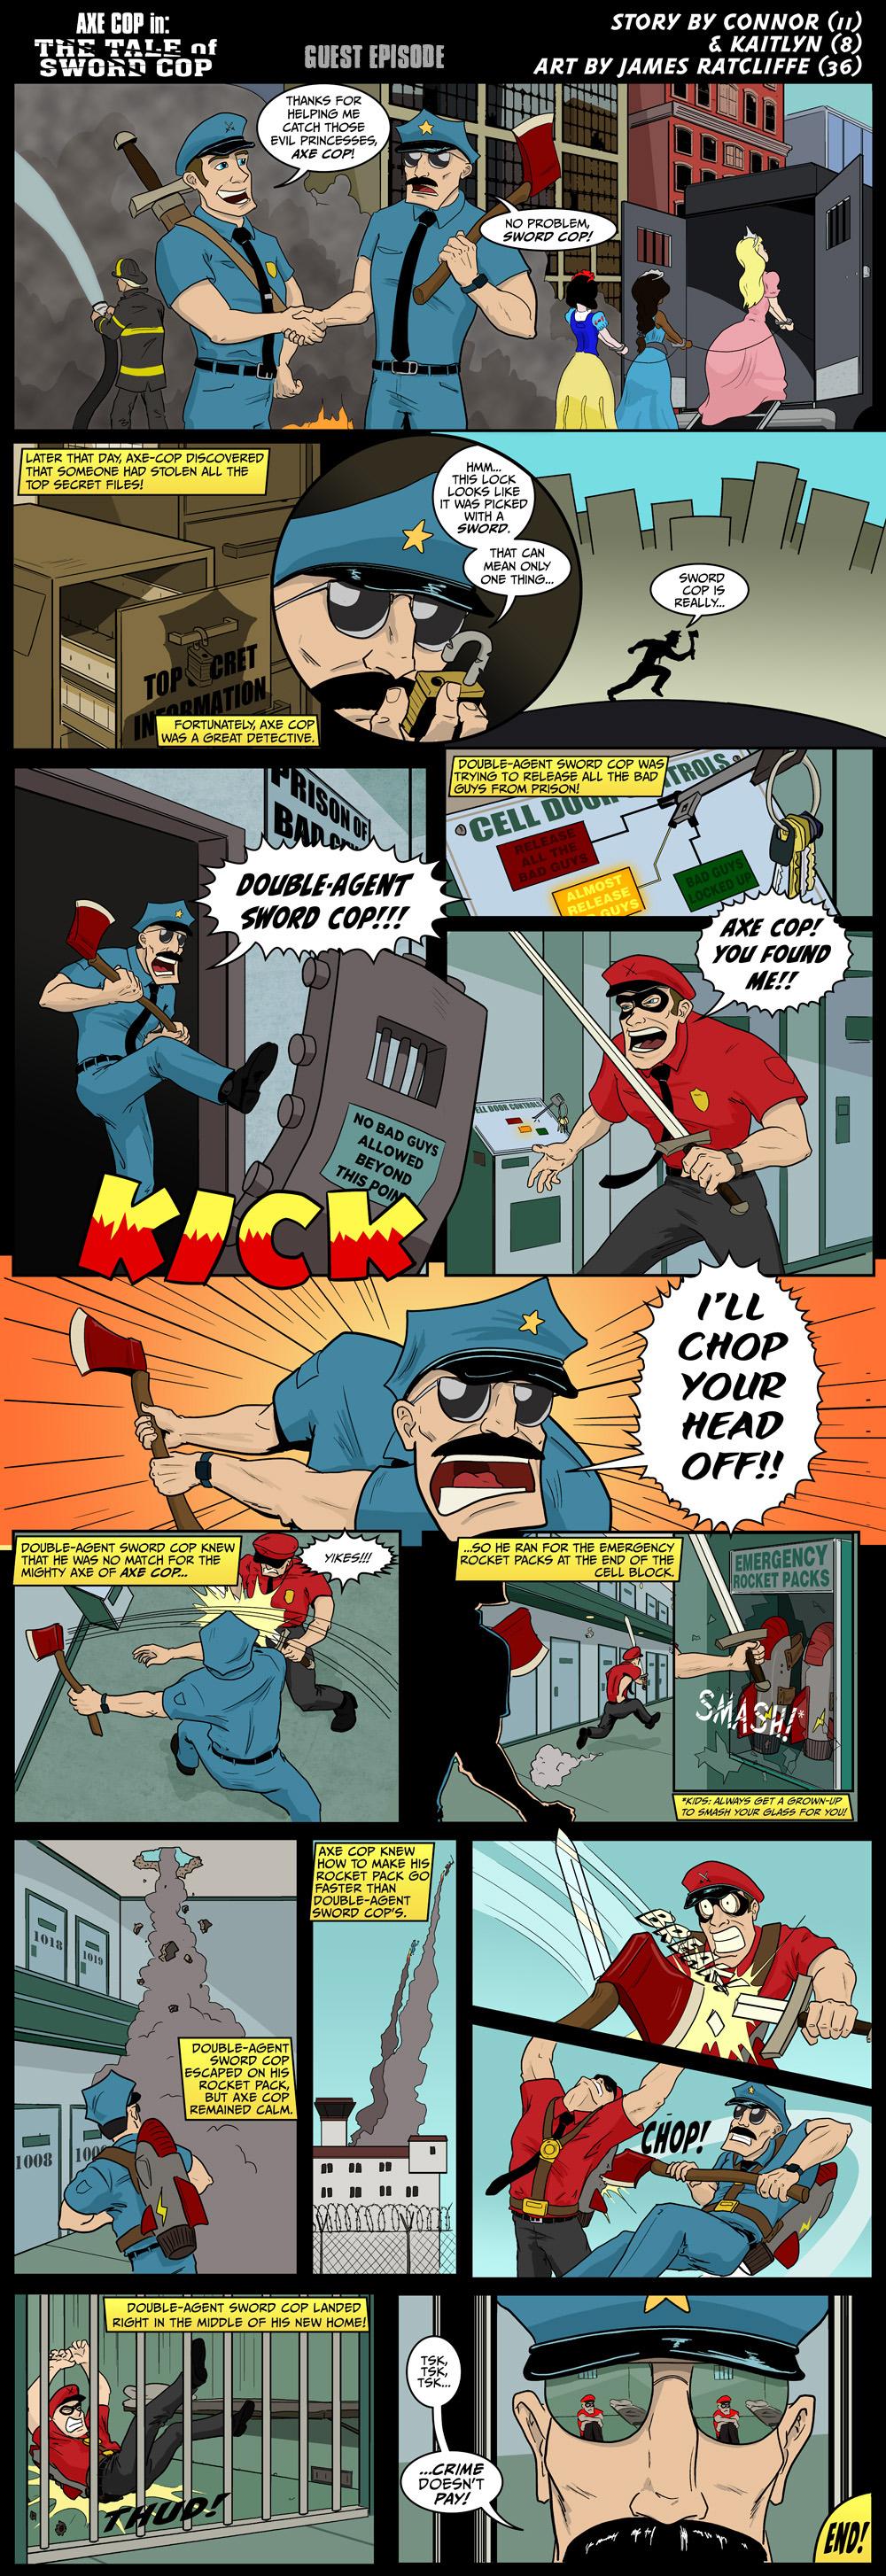 Axe Cop Guest Episode #41